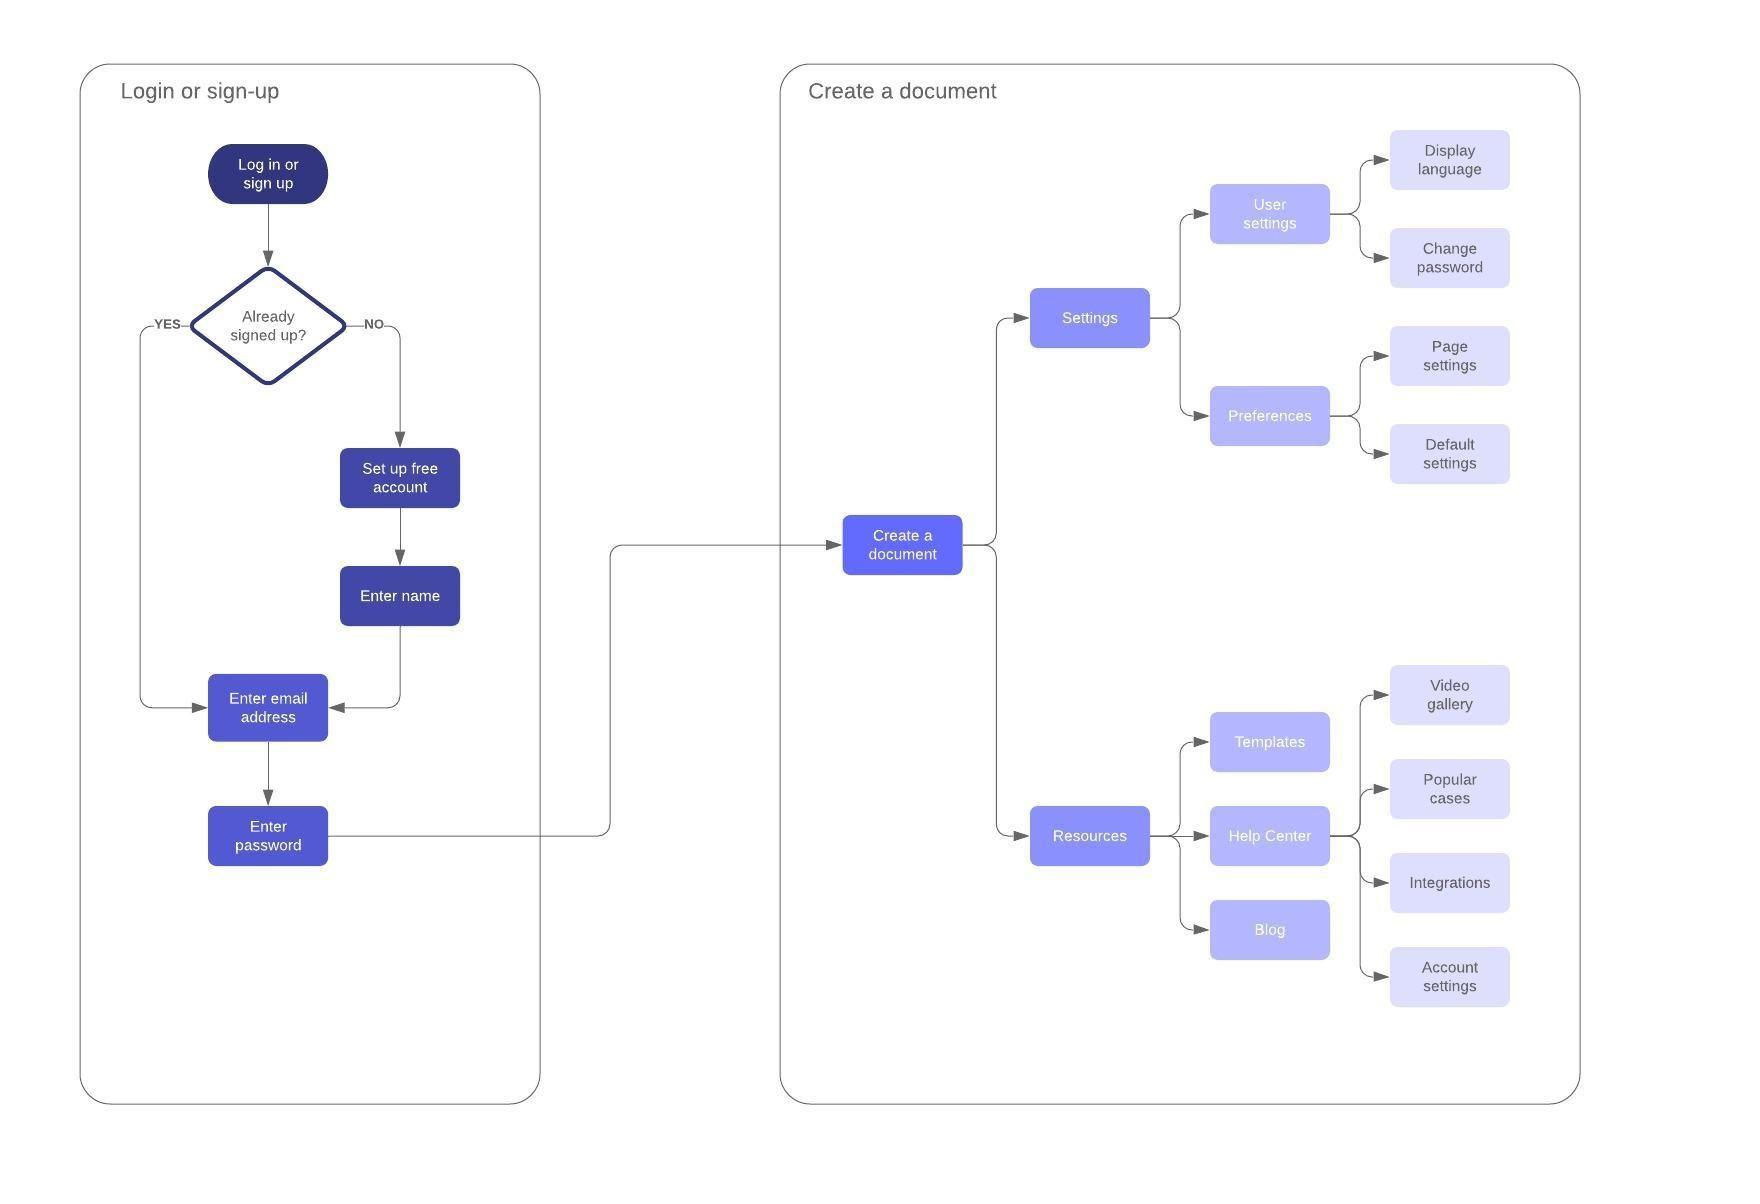 007 Outstanding Online Flow Chart Template High Resolution  Flowchart Proces DiagramFull